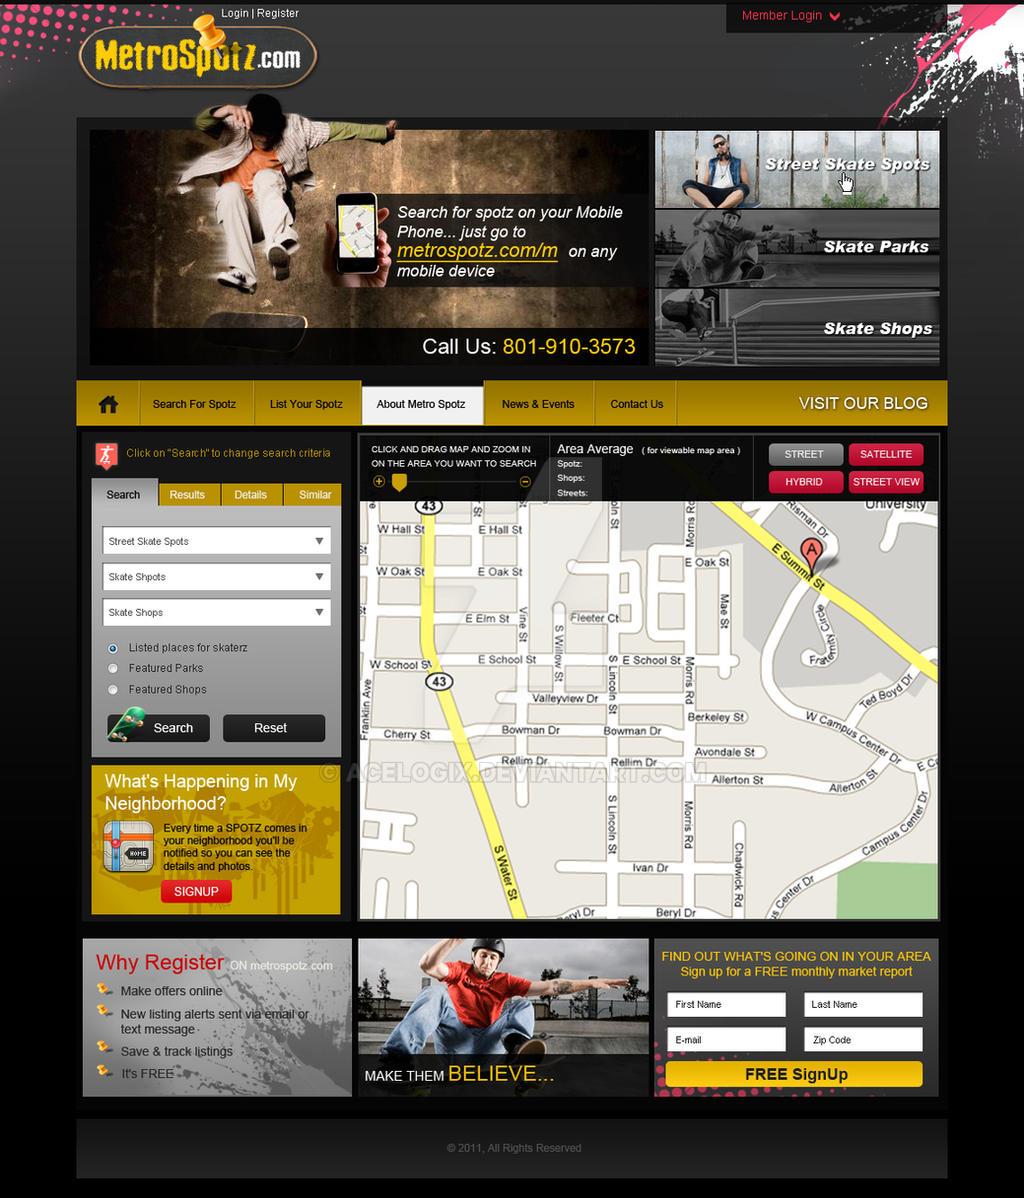 metrospotz website design by acelogix